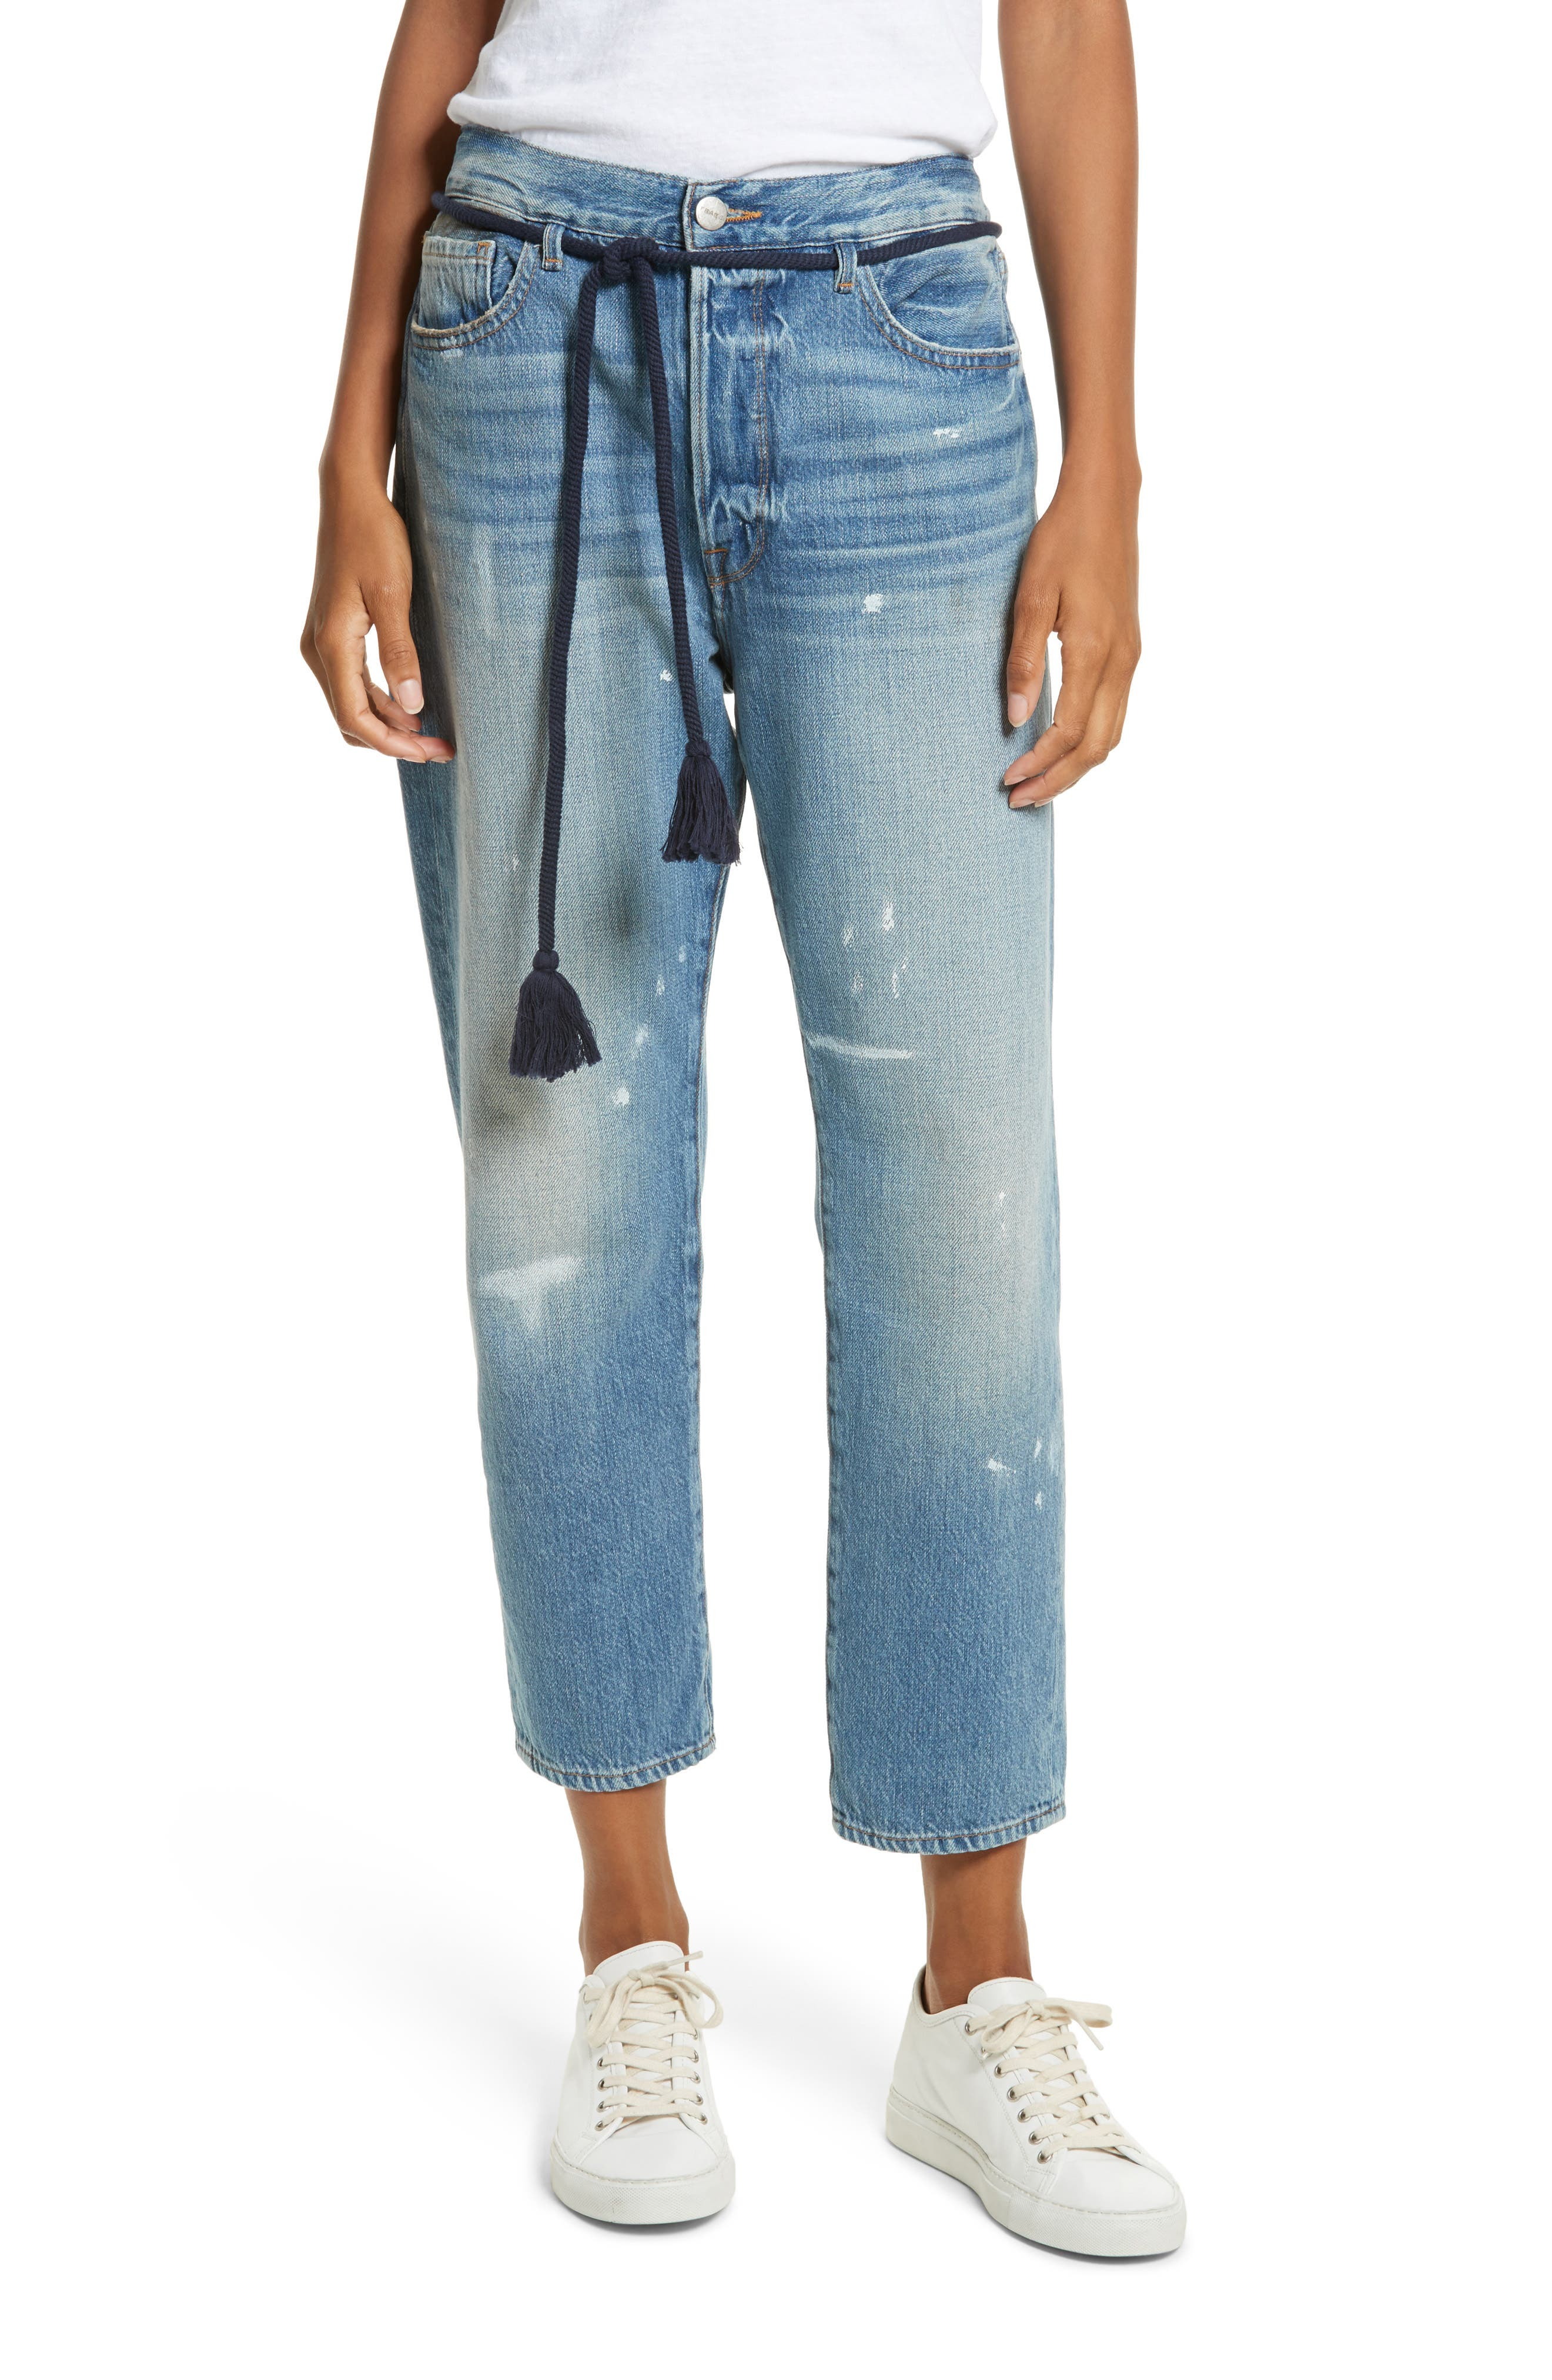 Le Original Tassel Tie High Waist Jeans,                             Main thumbnail 1, color,                             Bowman